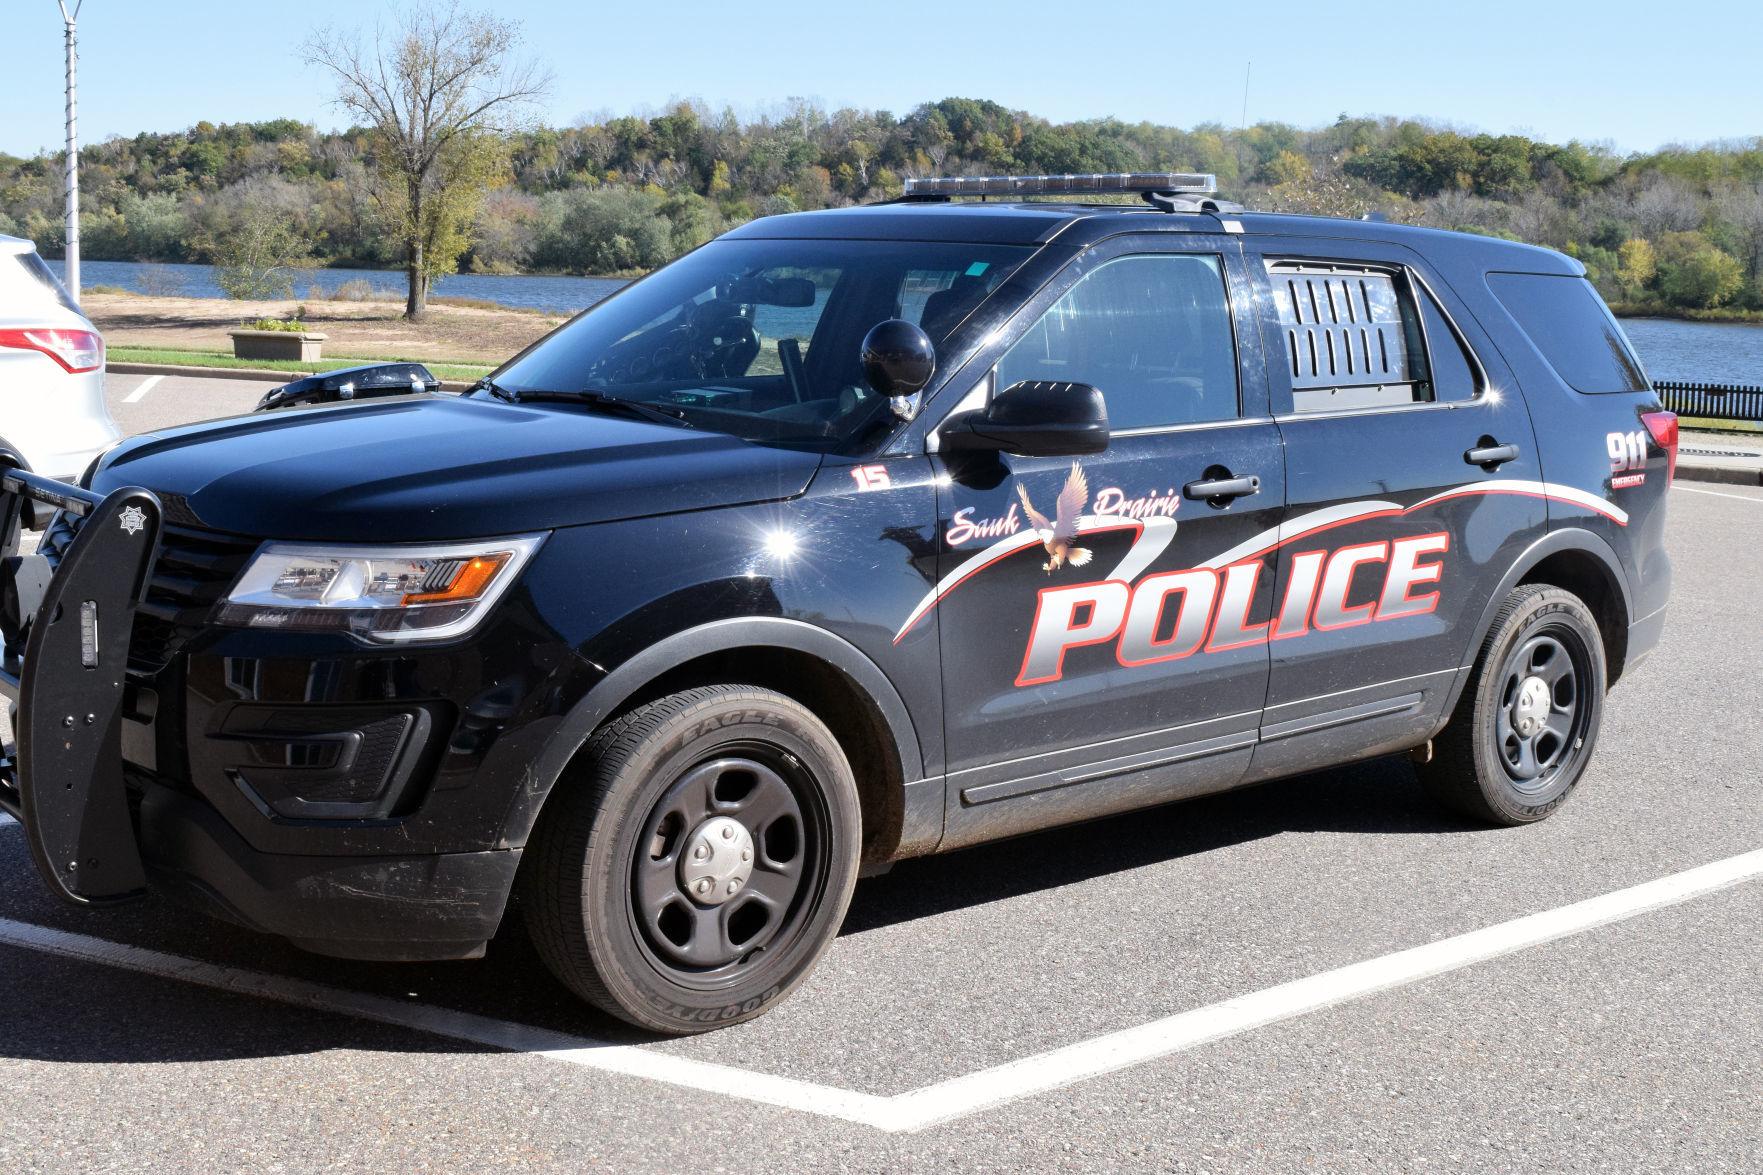 Sauk Prairie Police Department squad car